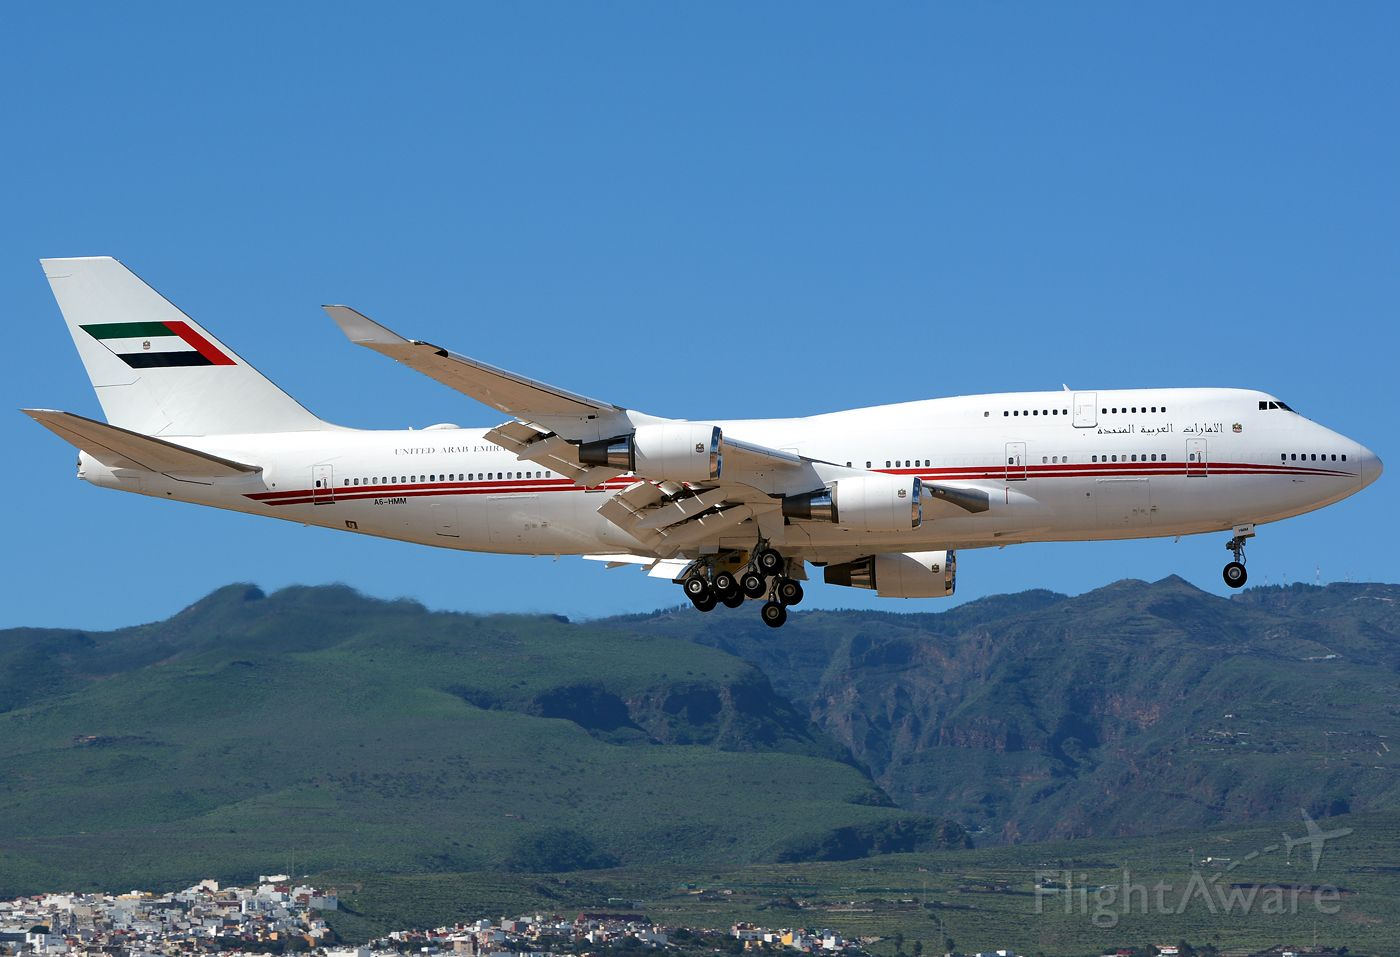 Boeing 747-400 (A6-HMM)